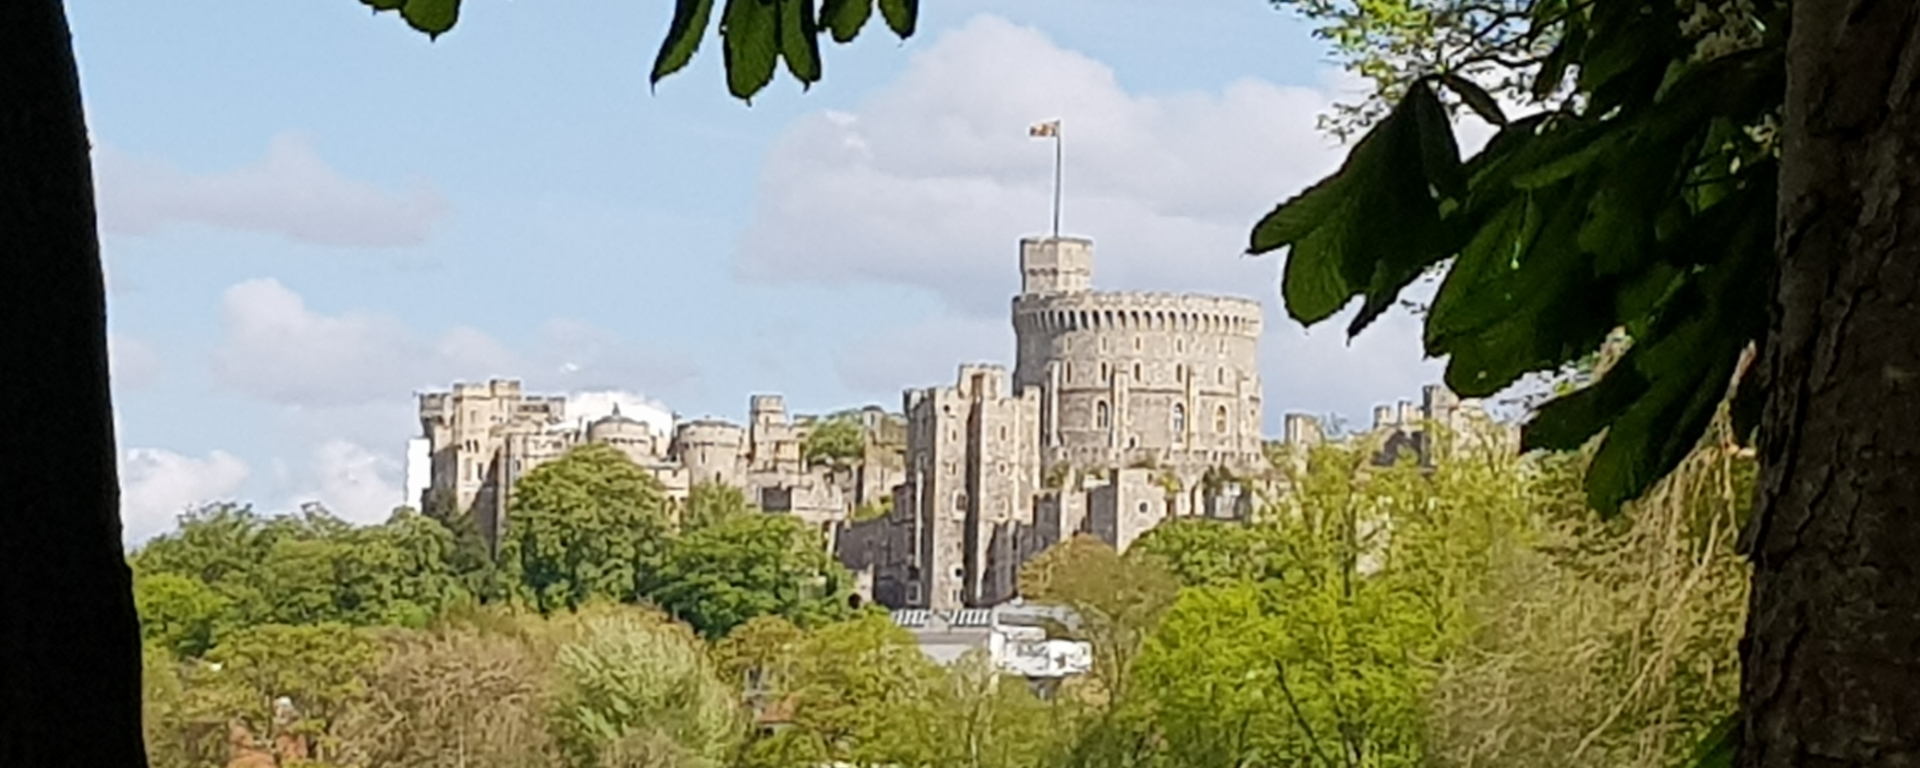 windsor castle from baths island